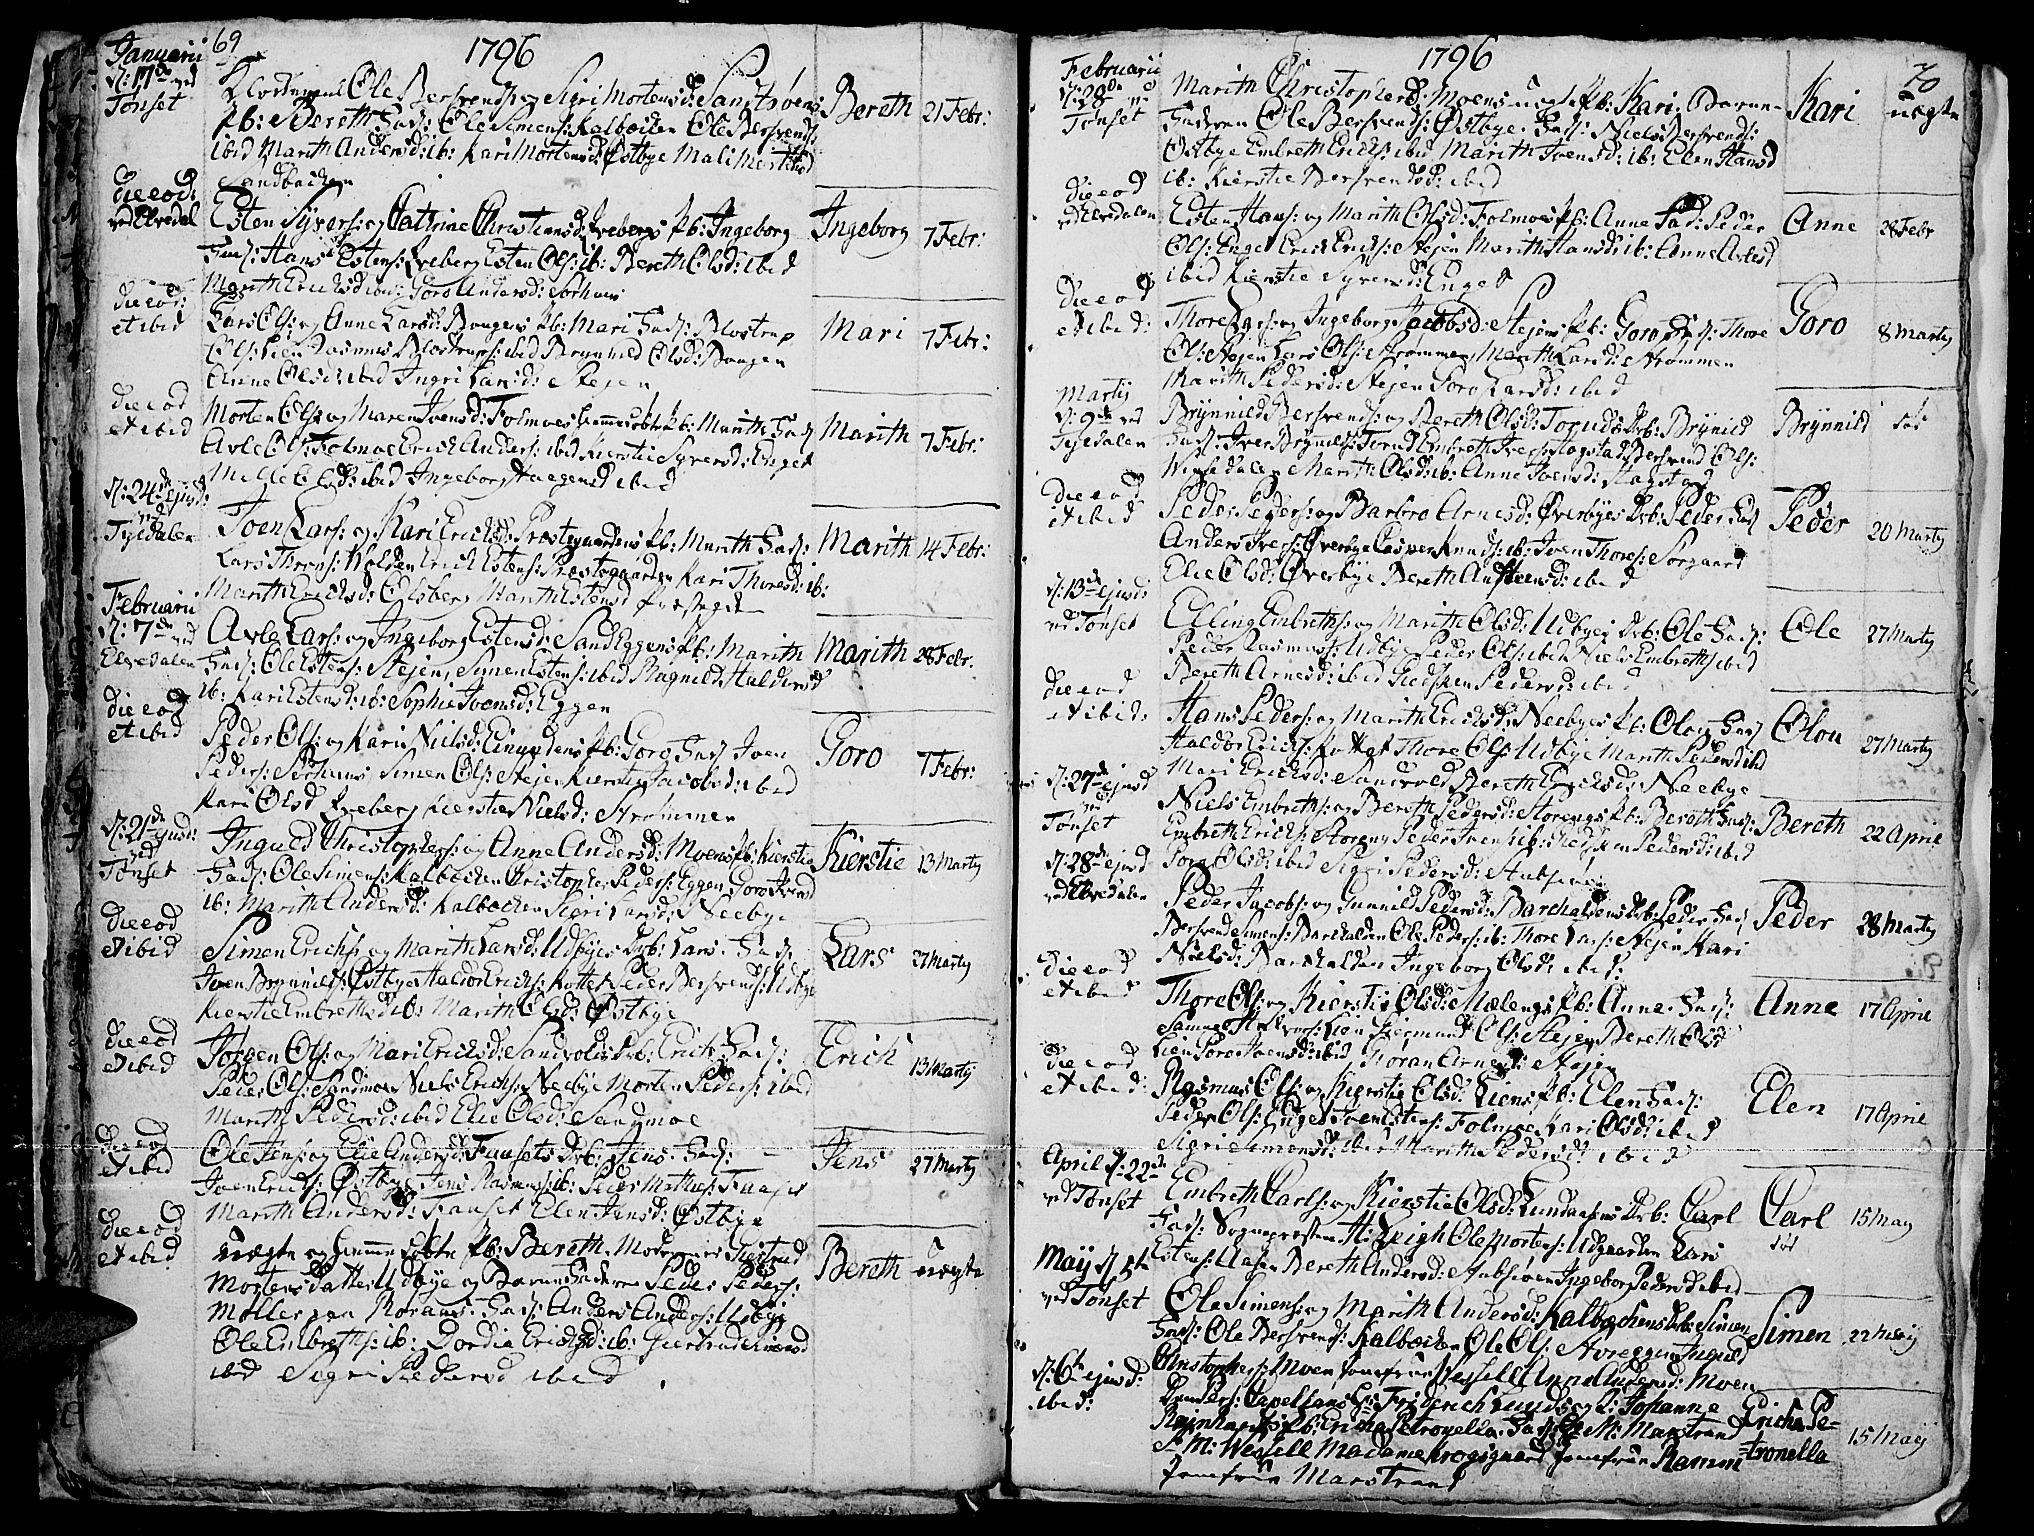 SAH, Tynset prestekontor, Ministerialbok nr. 14, 1790-1800, s. 69-70